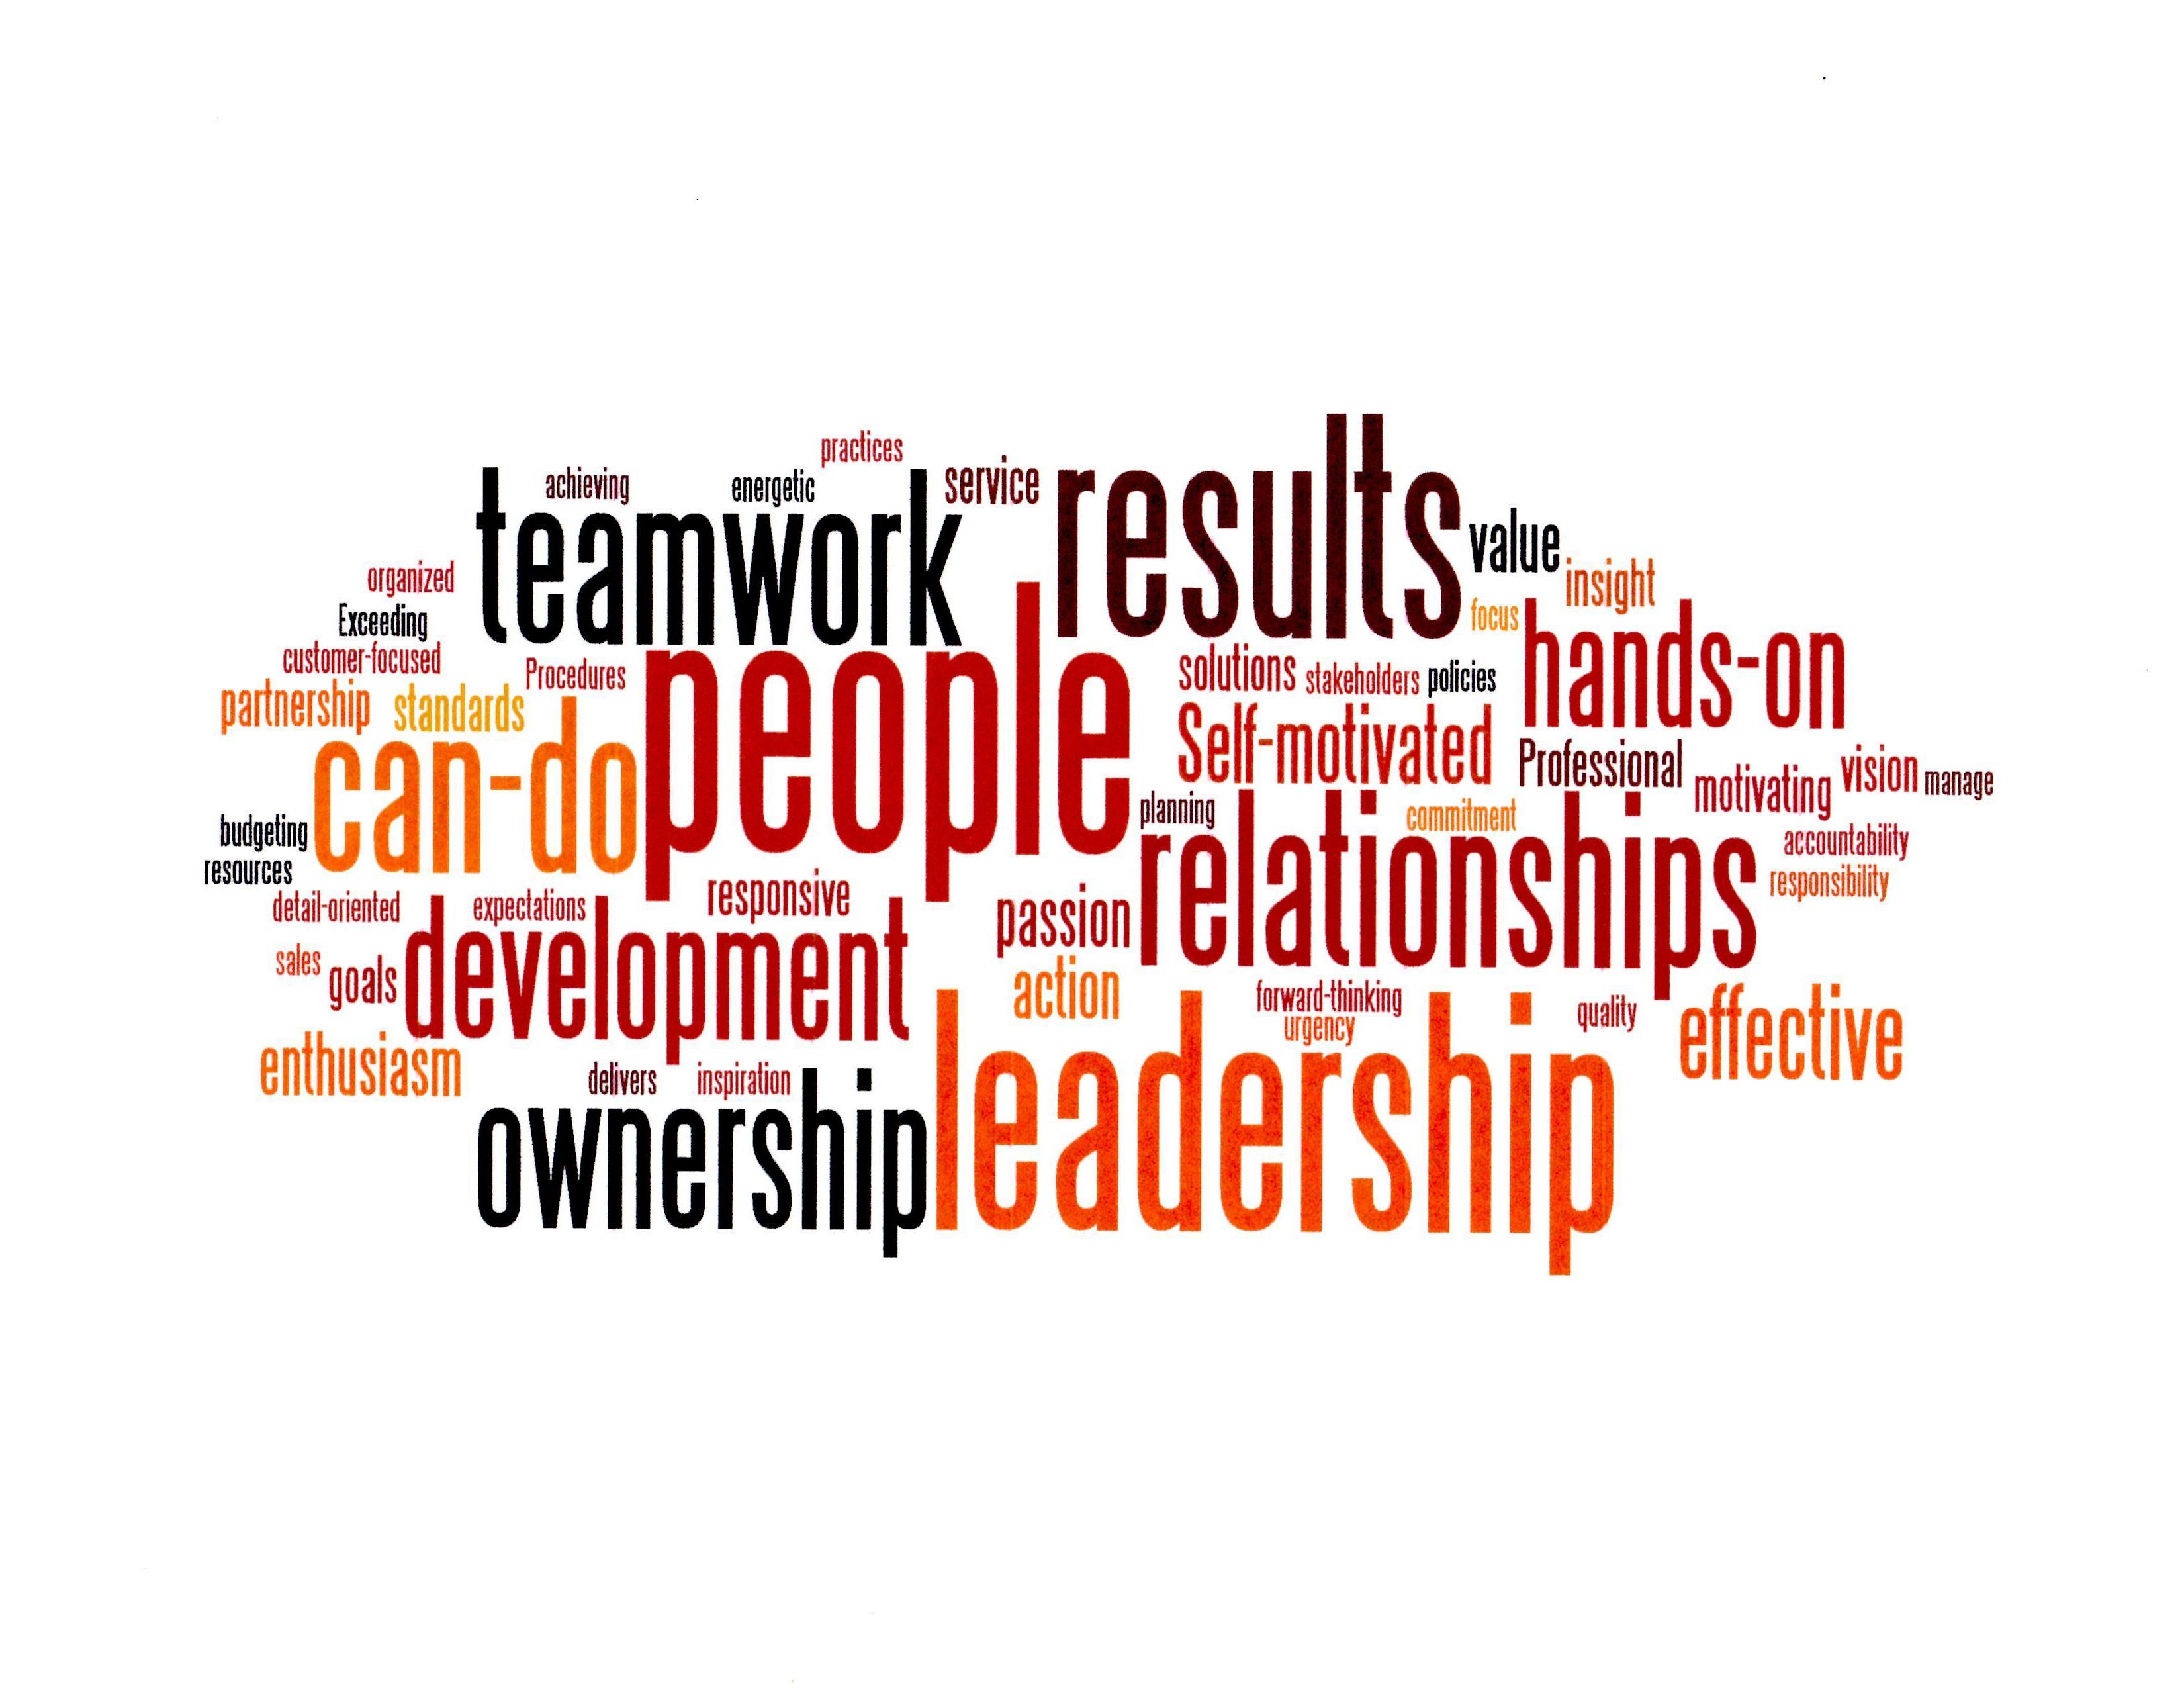 word team leadership clouds leaders cloud teamwork ownership results performance hands linkedin text